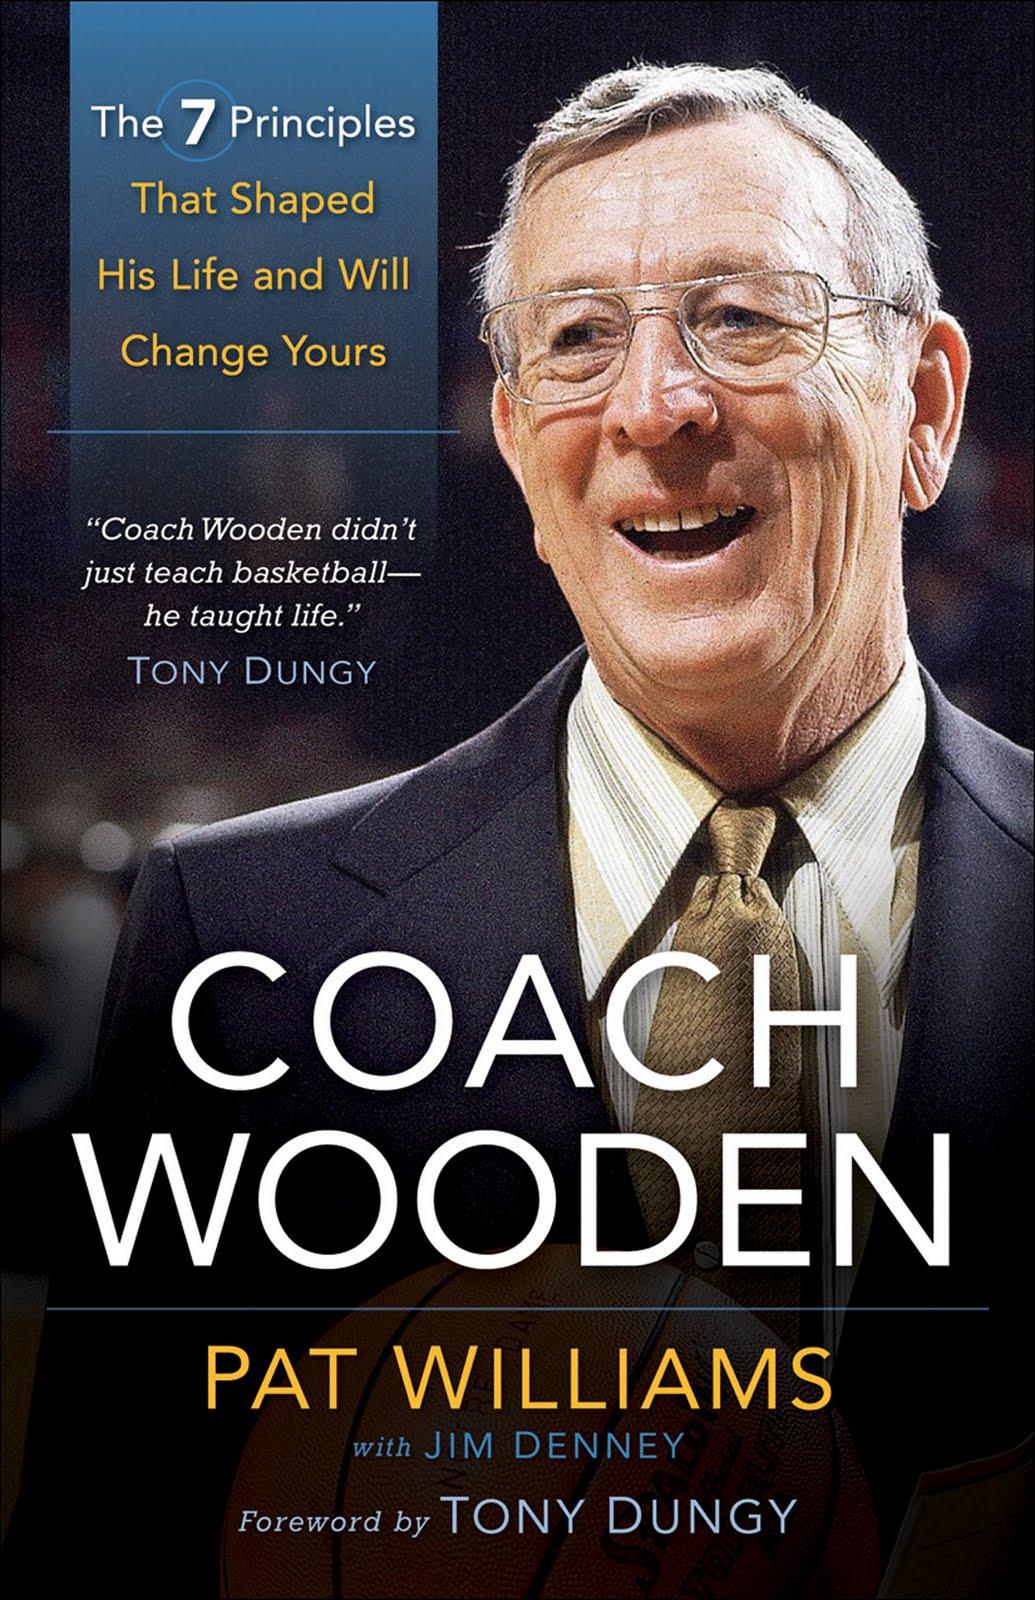 Basketball coaching books top 10 - June